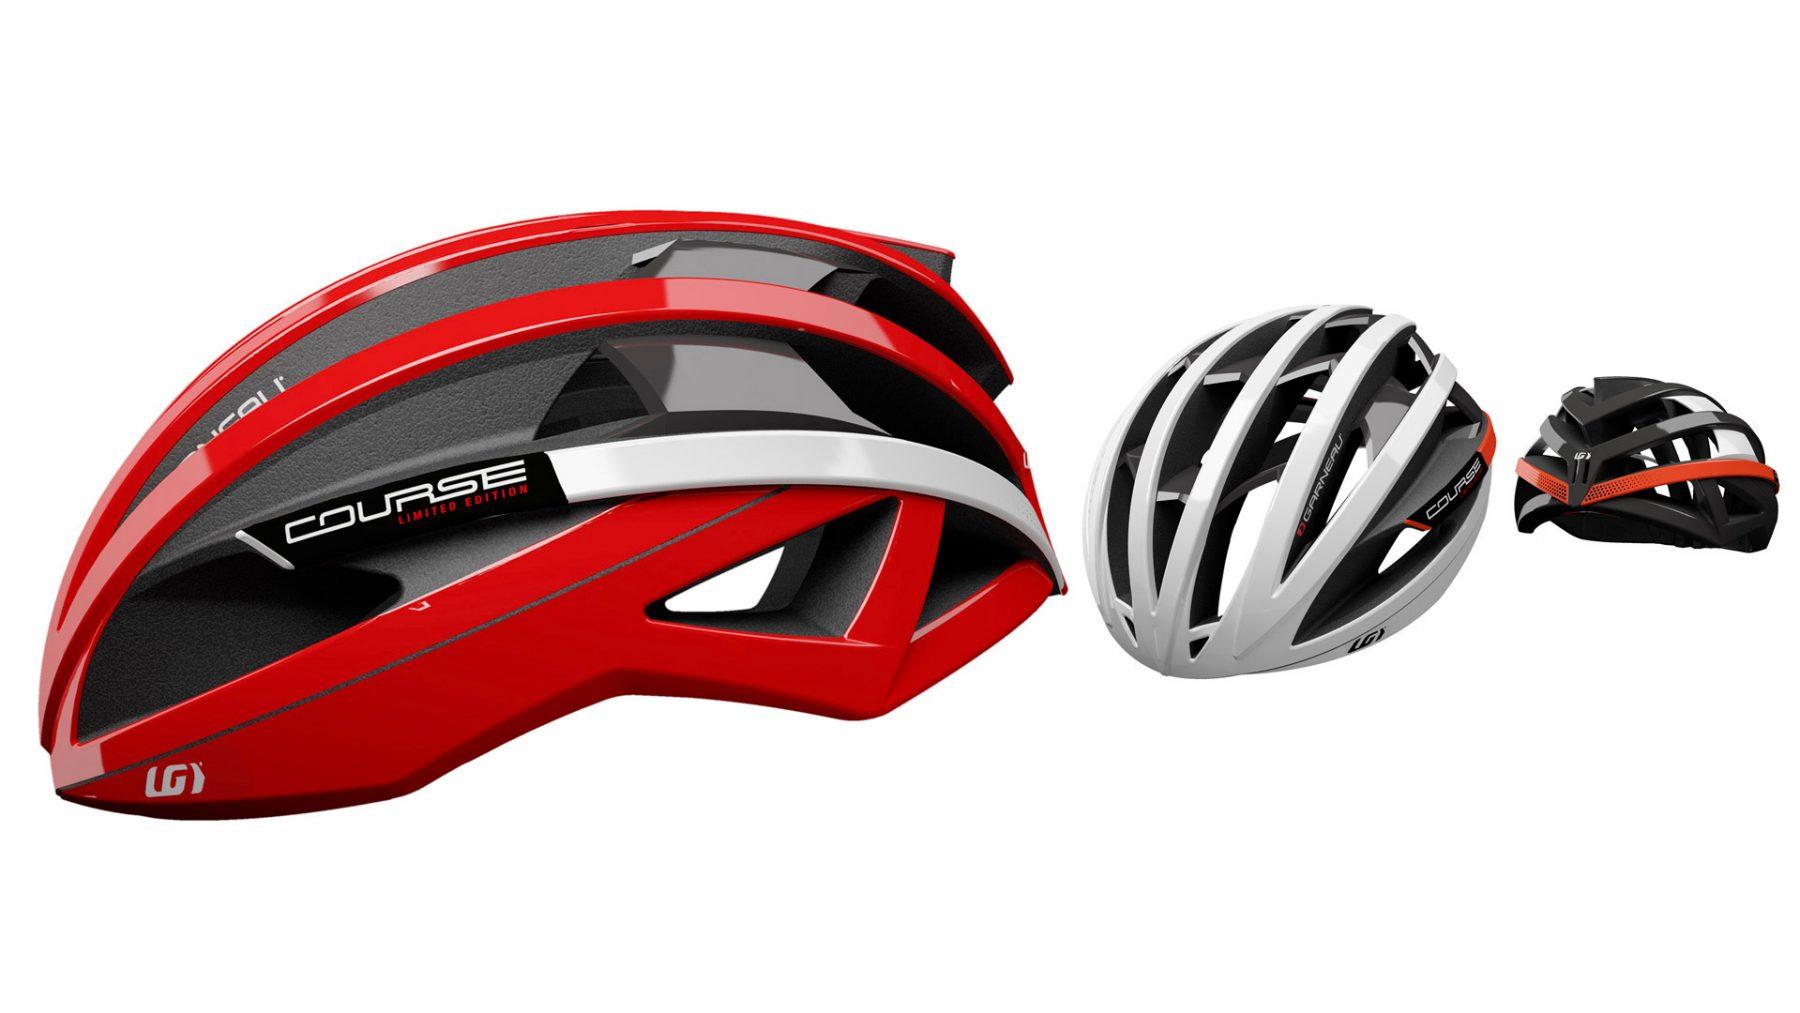 3d-graphic-building-display-bicycle-helmet